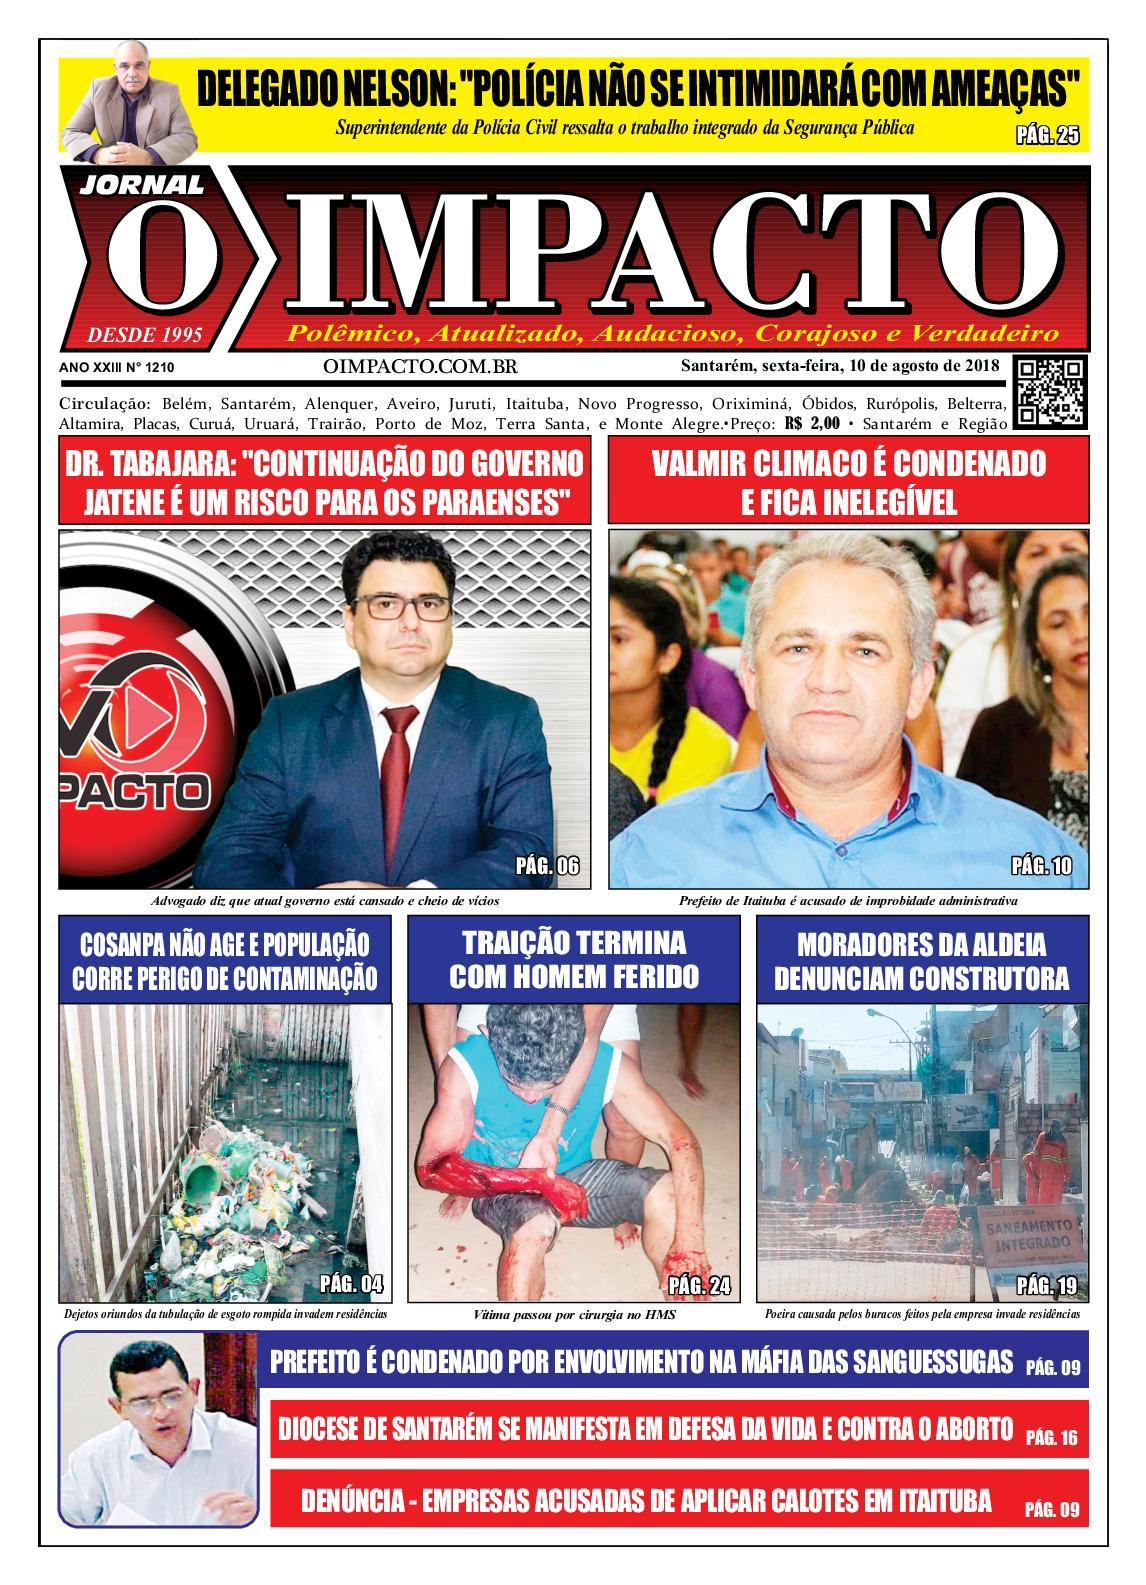 Anelise Pelada calaméo - jornal o impacto ed. 1210